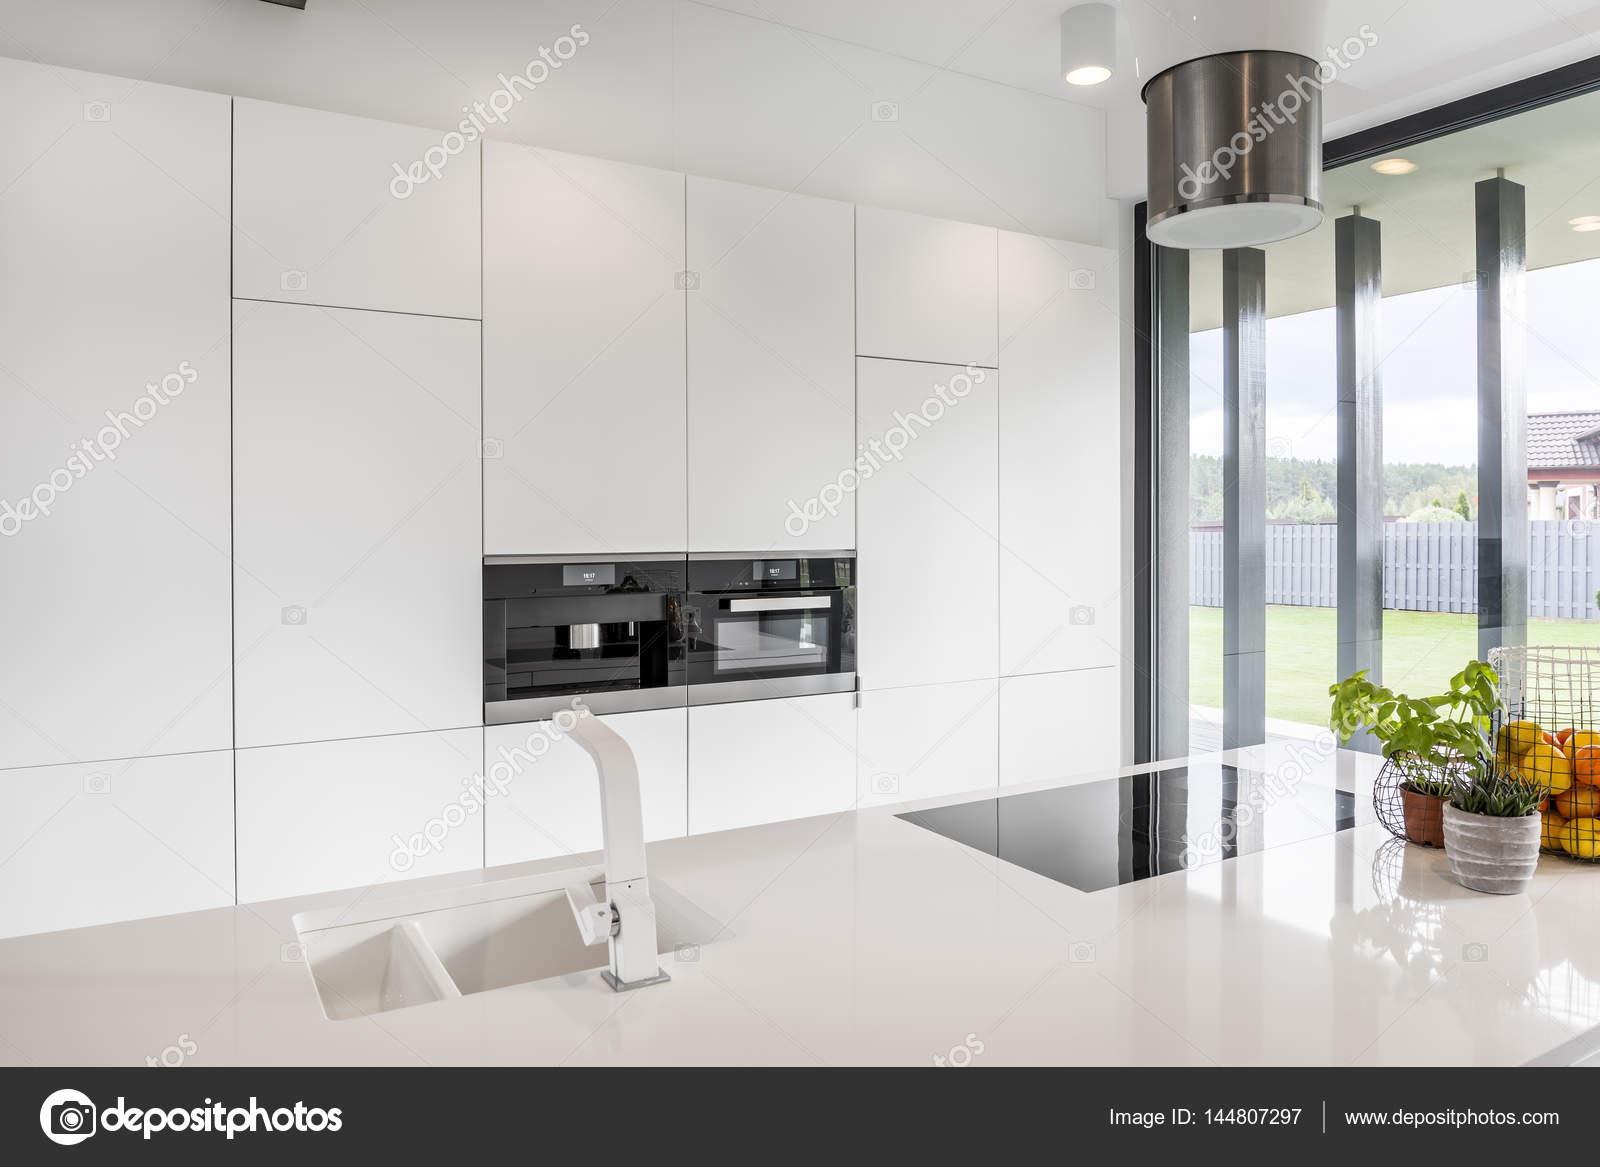 Minimalistische keuken interieur u stockfoto photographee eu